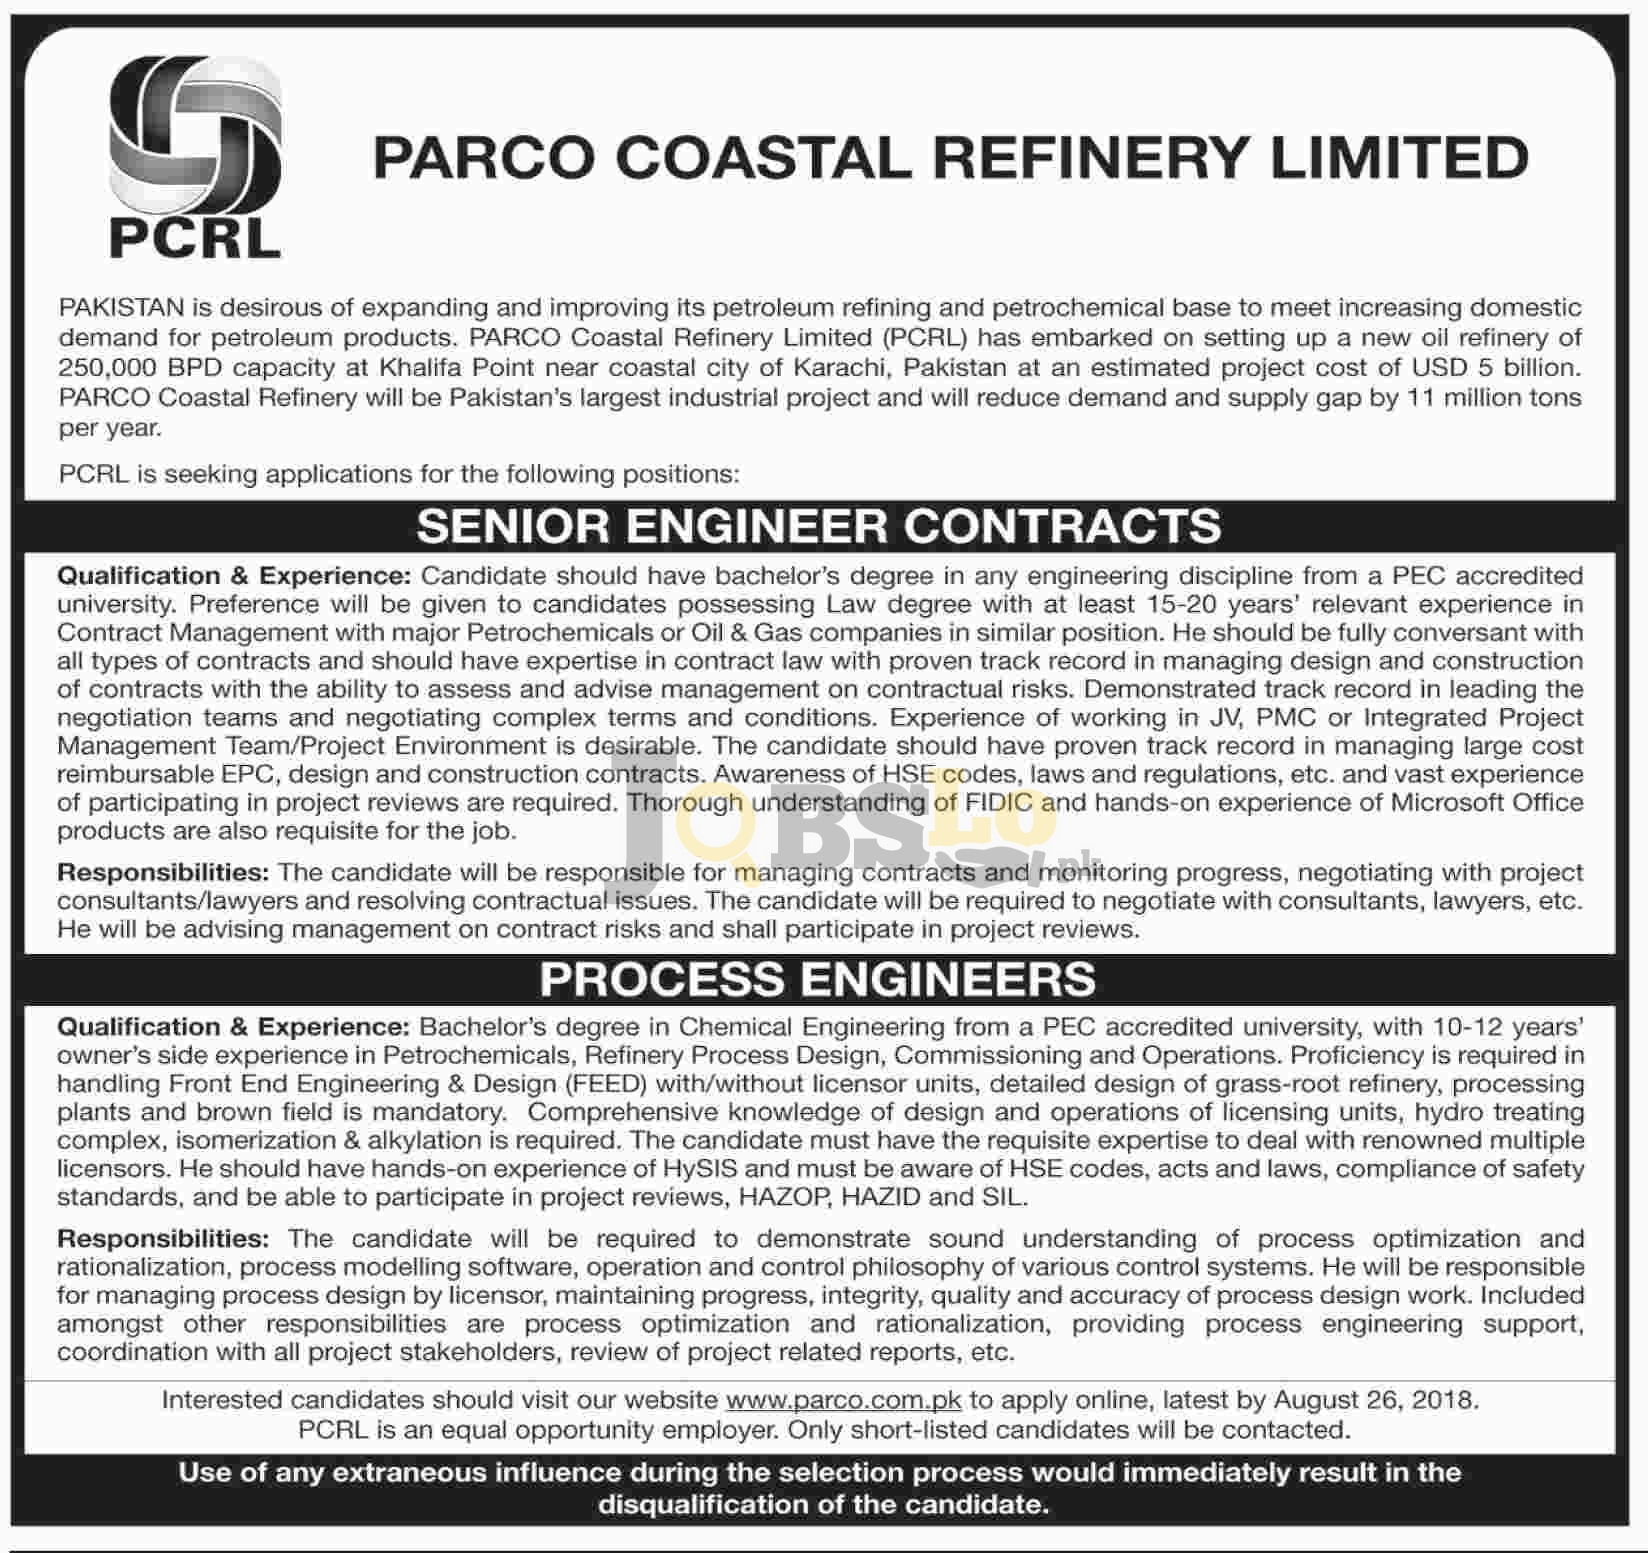 Parco Trainee Engineer Jobs 2018 Apply Online Latest Vacancies